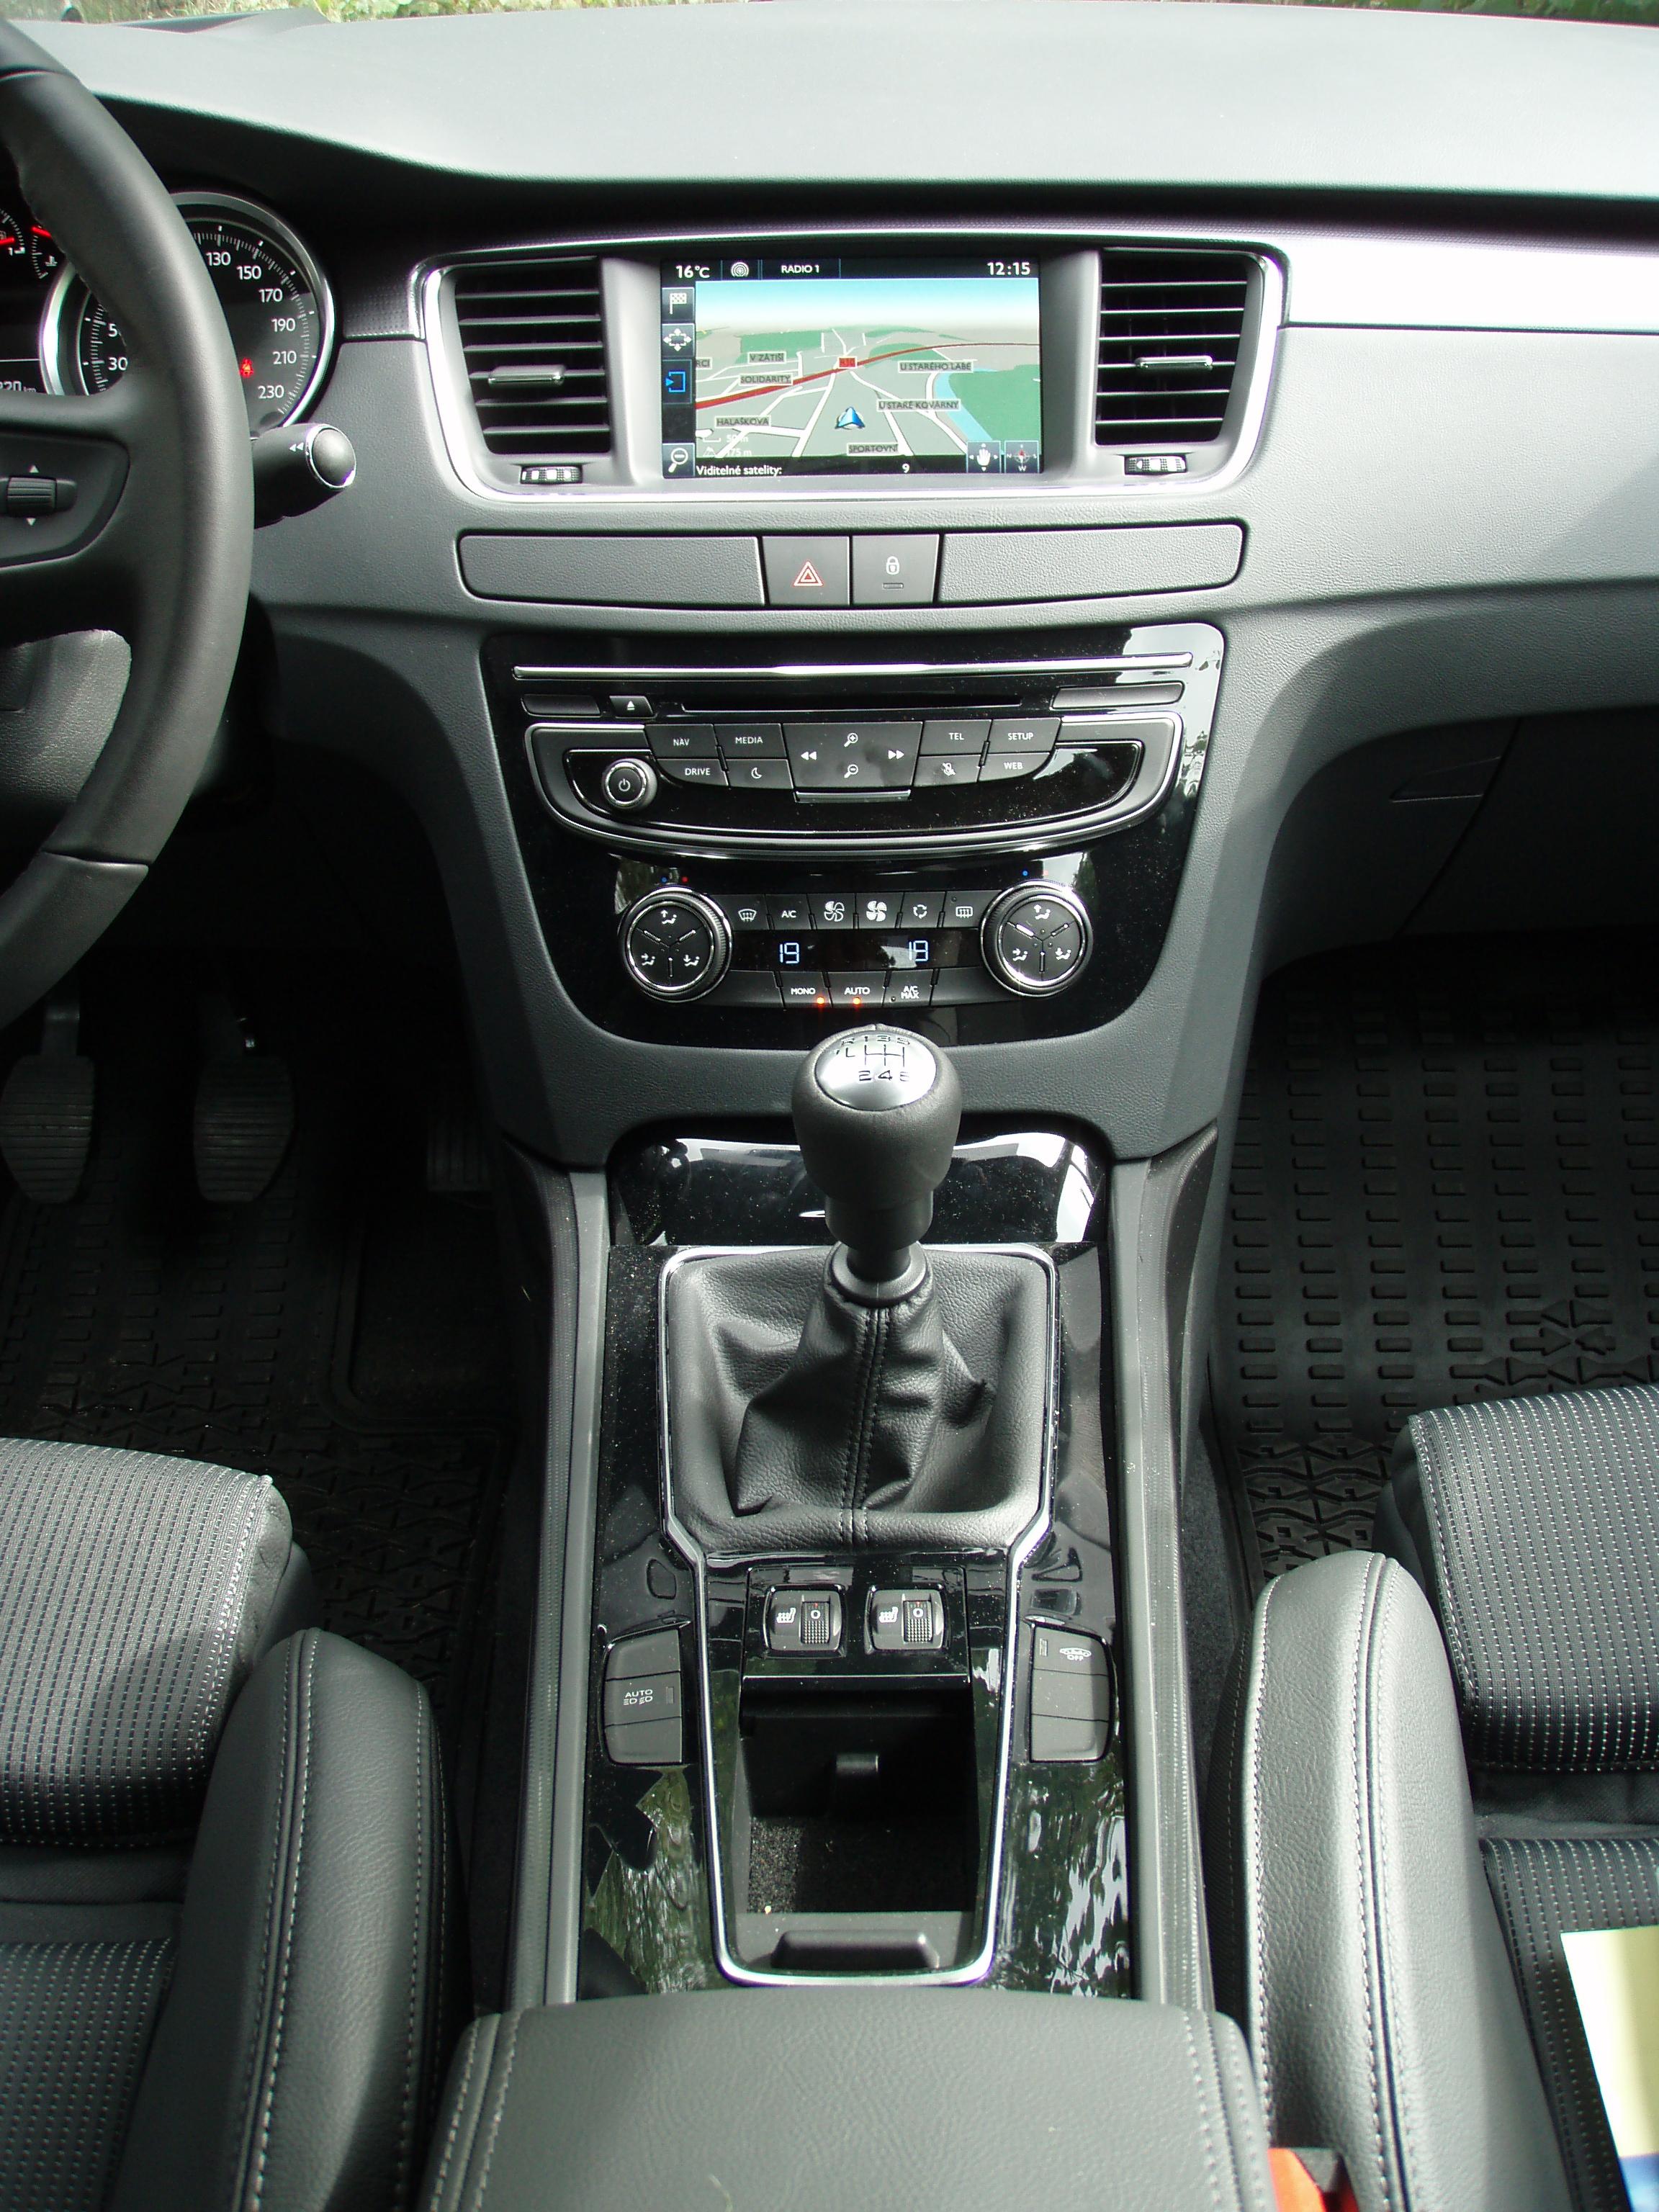 Peugeot 508 2014 interior images galleries with a bite - Interior peugeot 508 ...